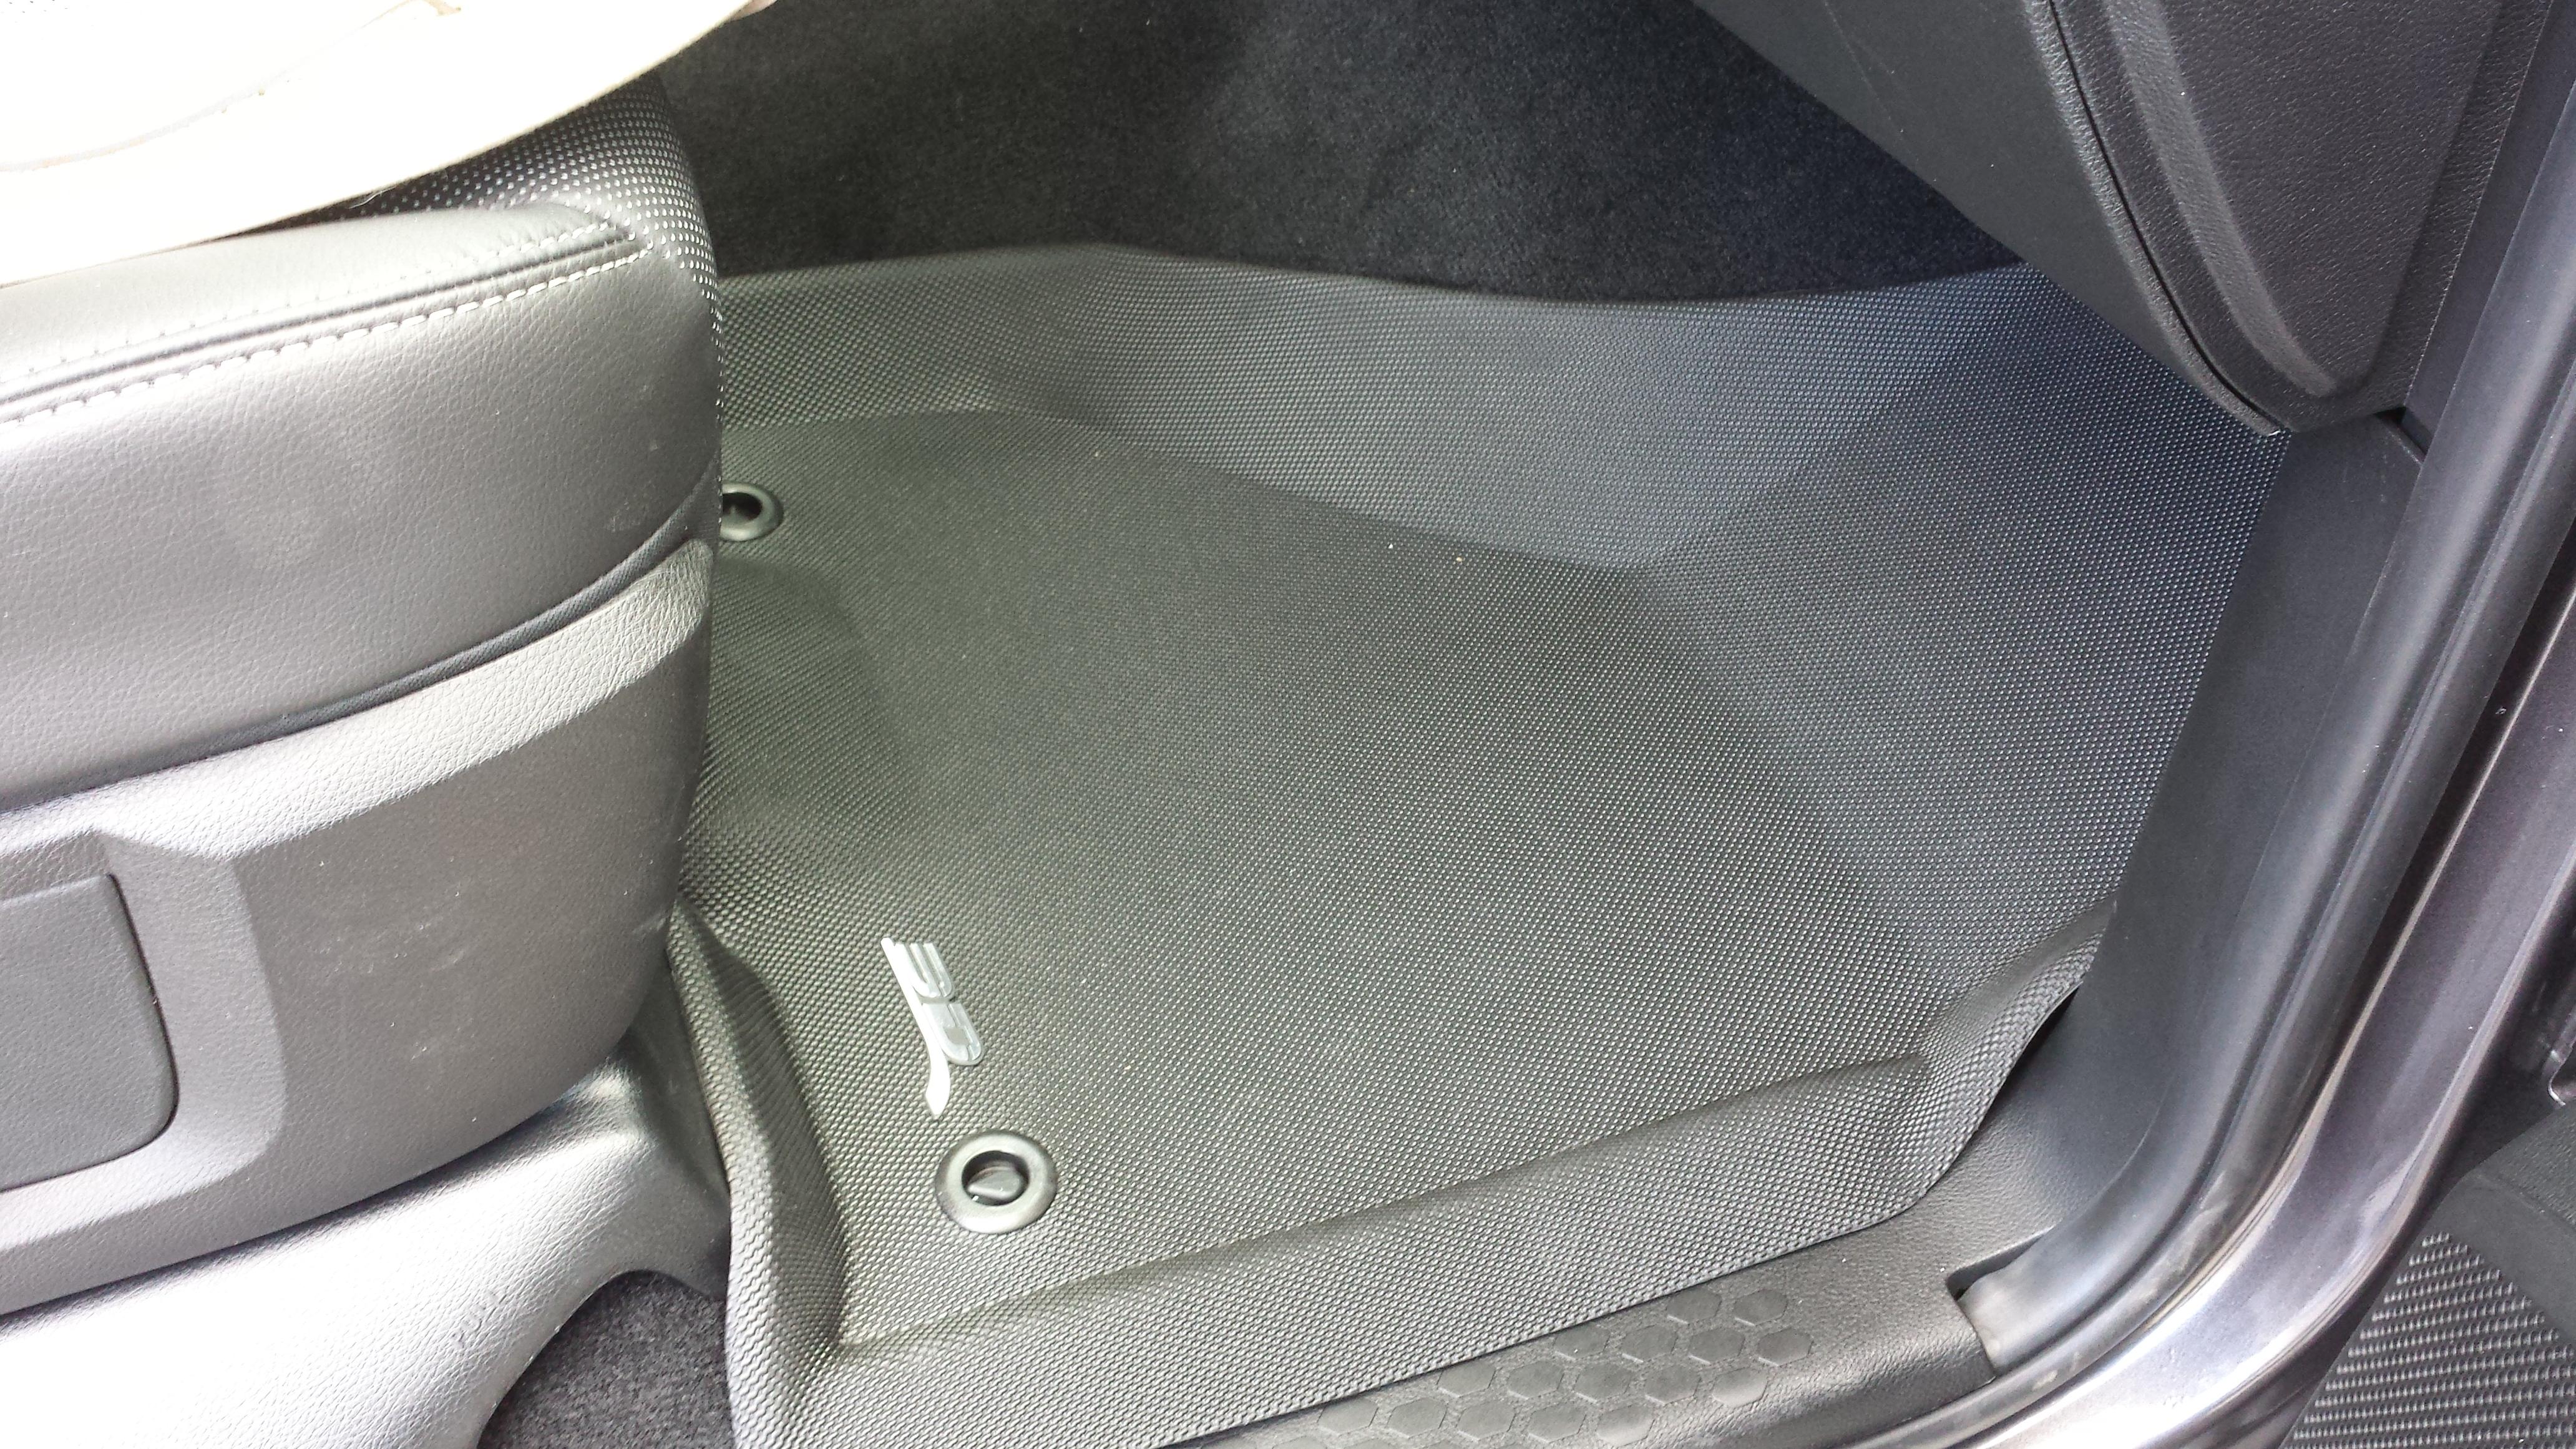 shop cx heavy row mats car liners mazda aries duty com premium by walmart floor